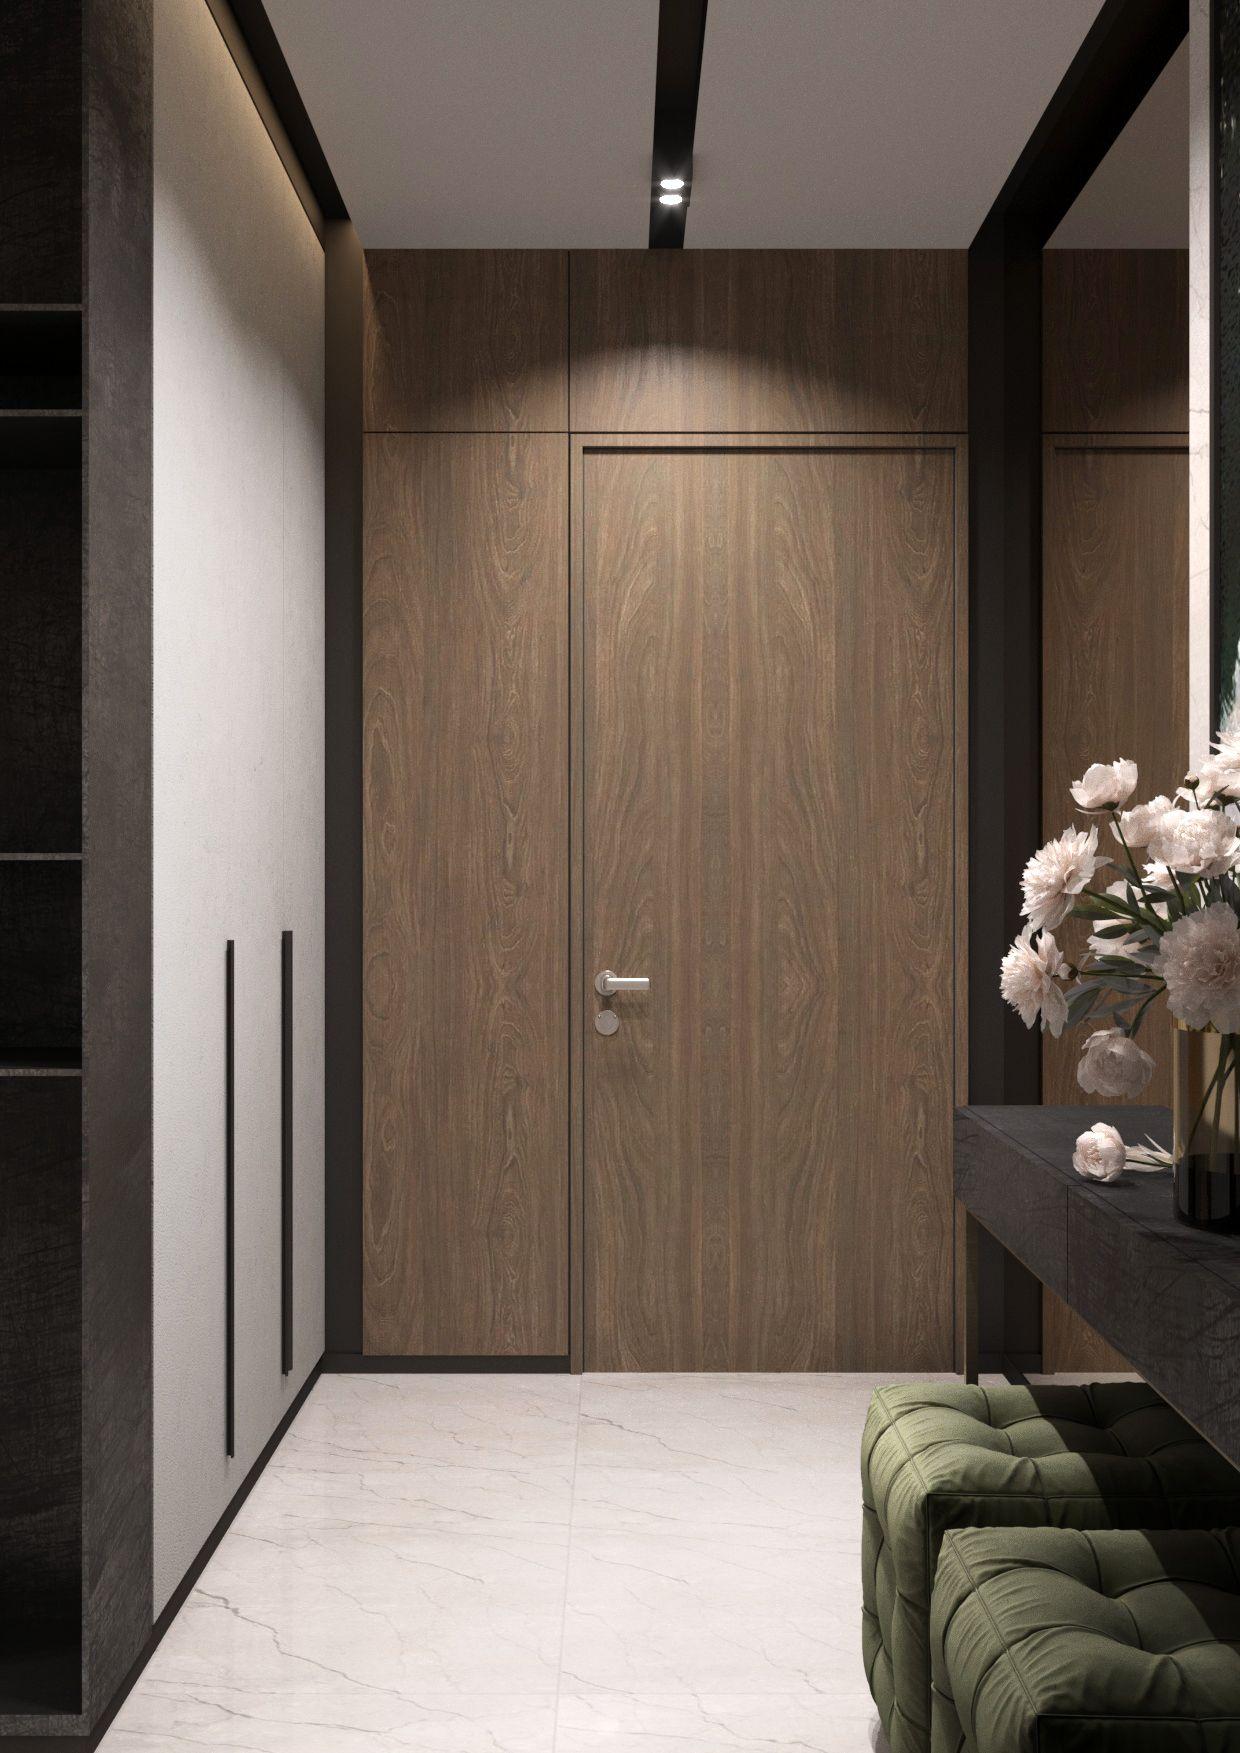 Pin by Emilio Bonilla on works  Elegant interior design, Entrance